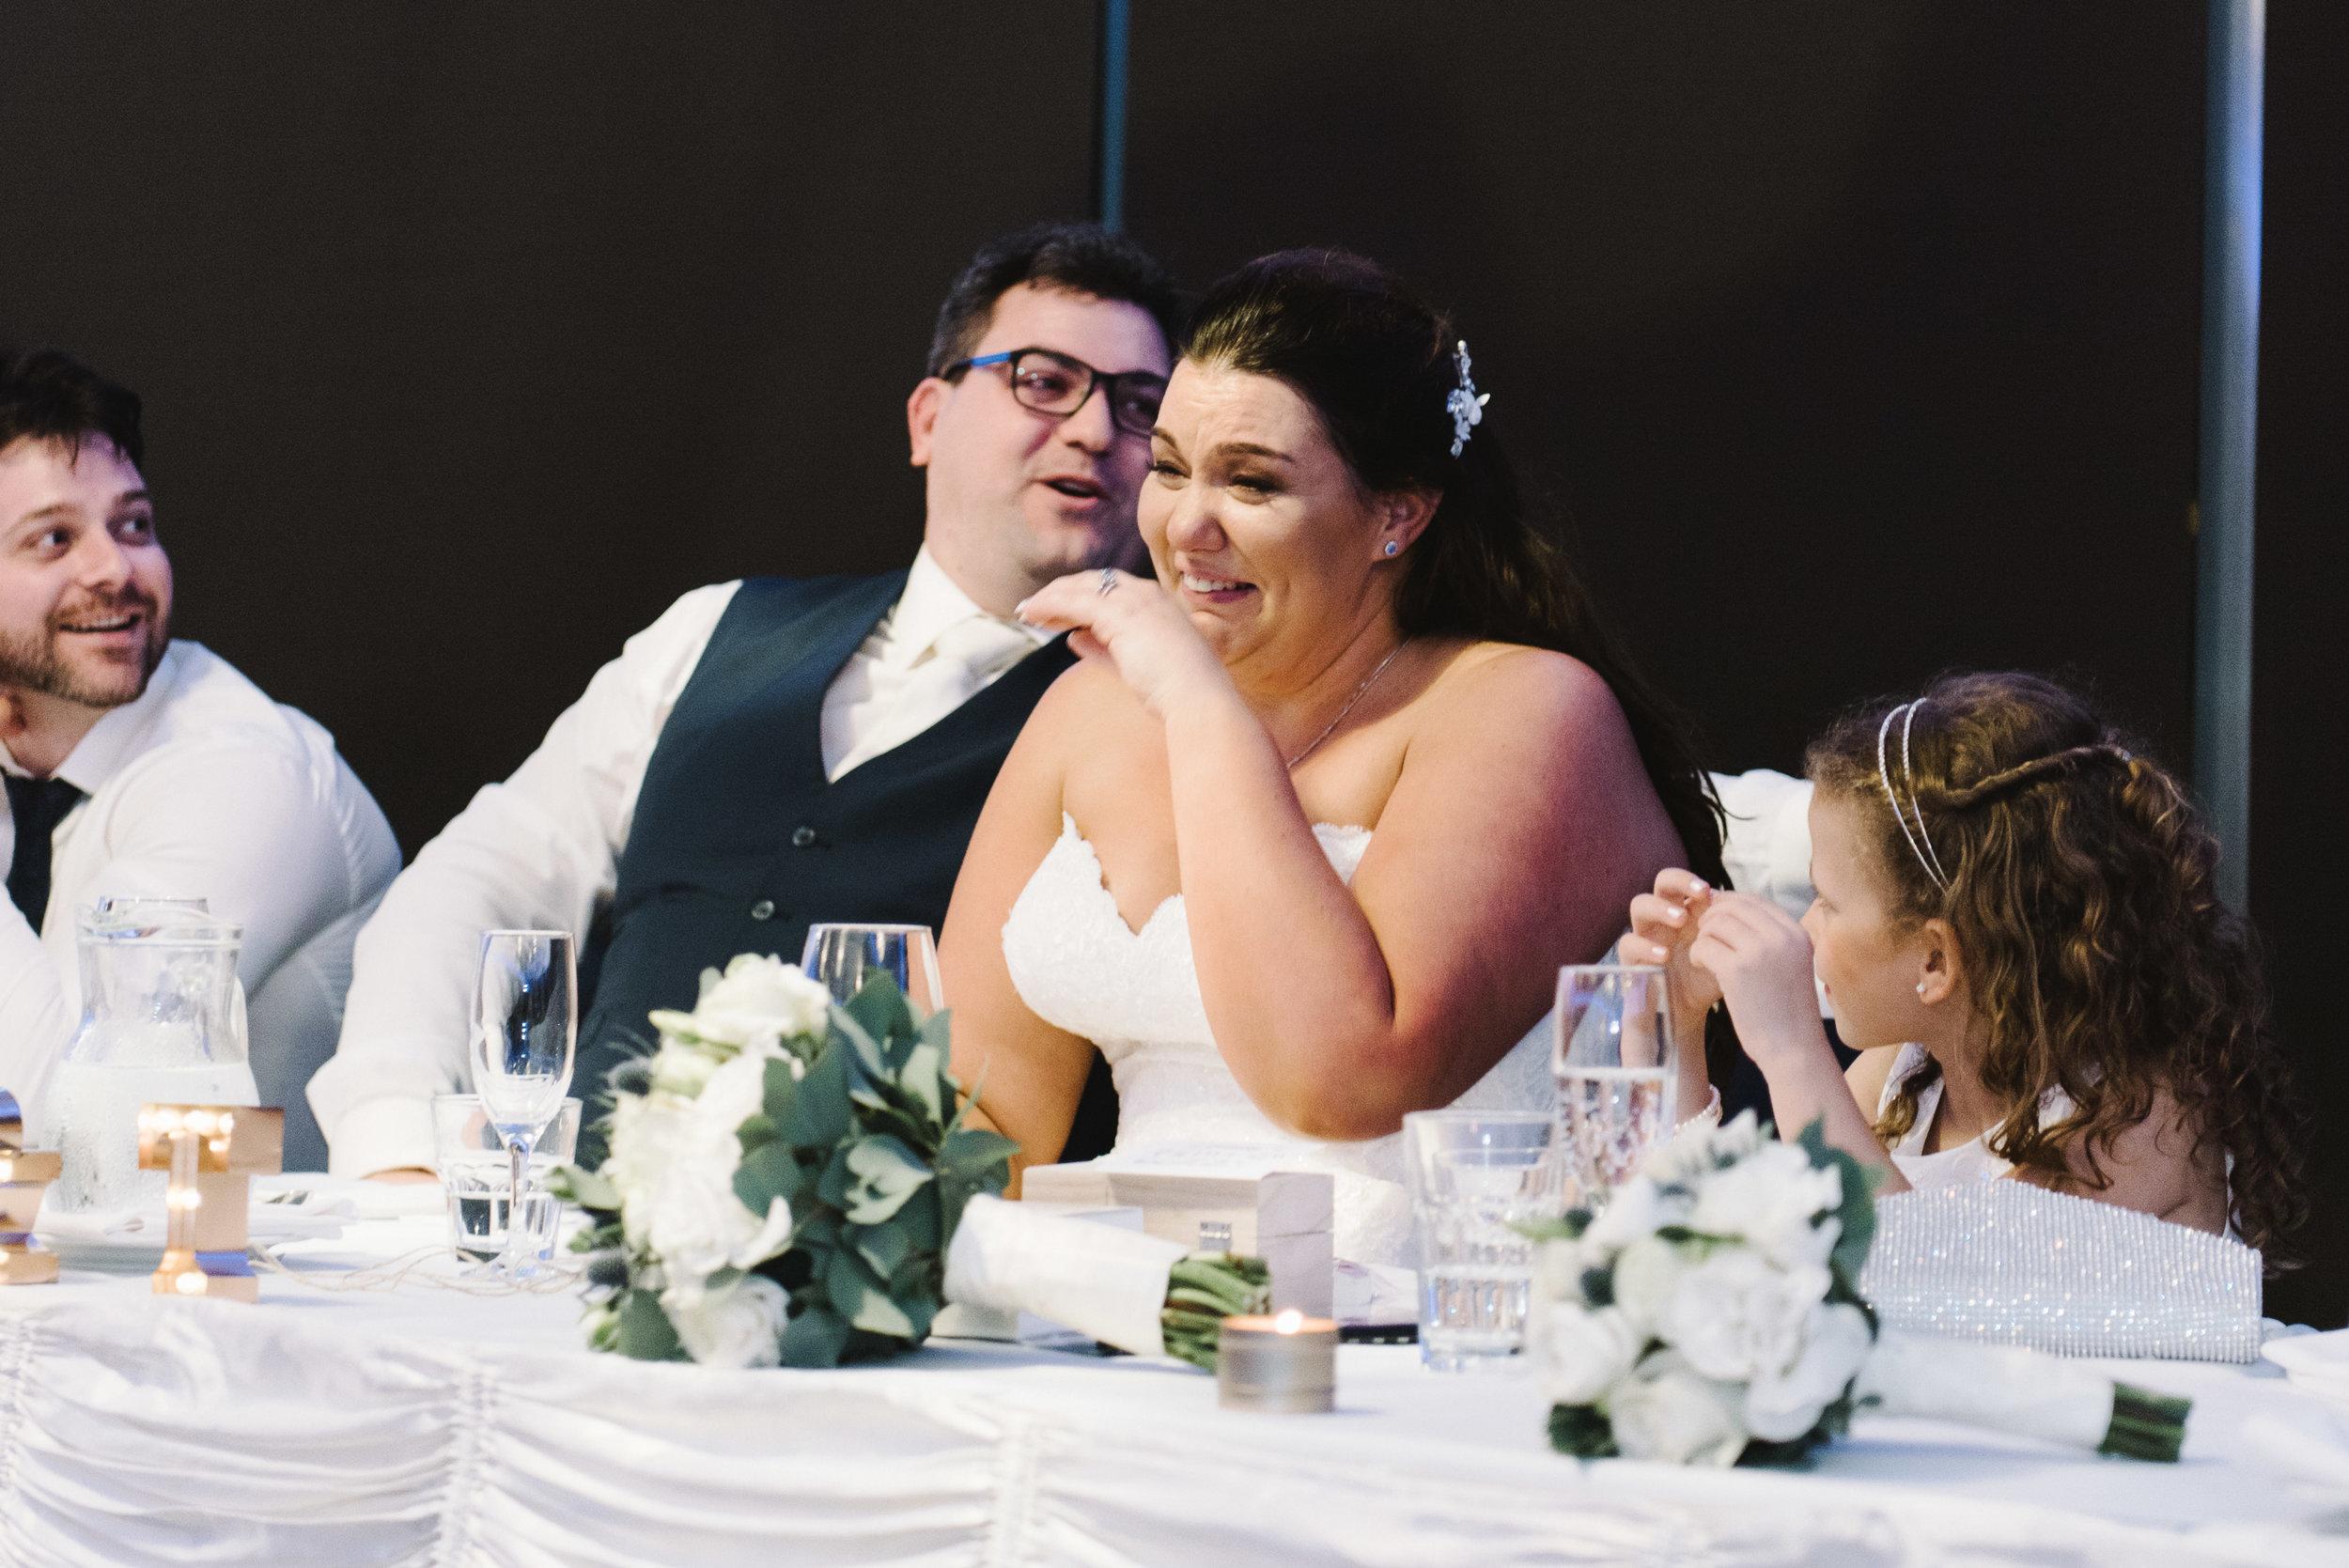 brisbane-wedding-photographer-114.jpg